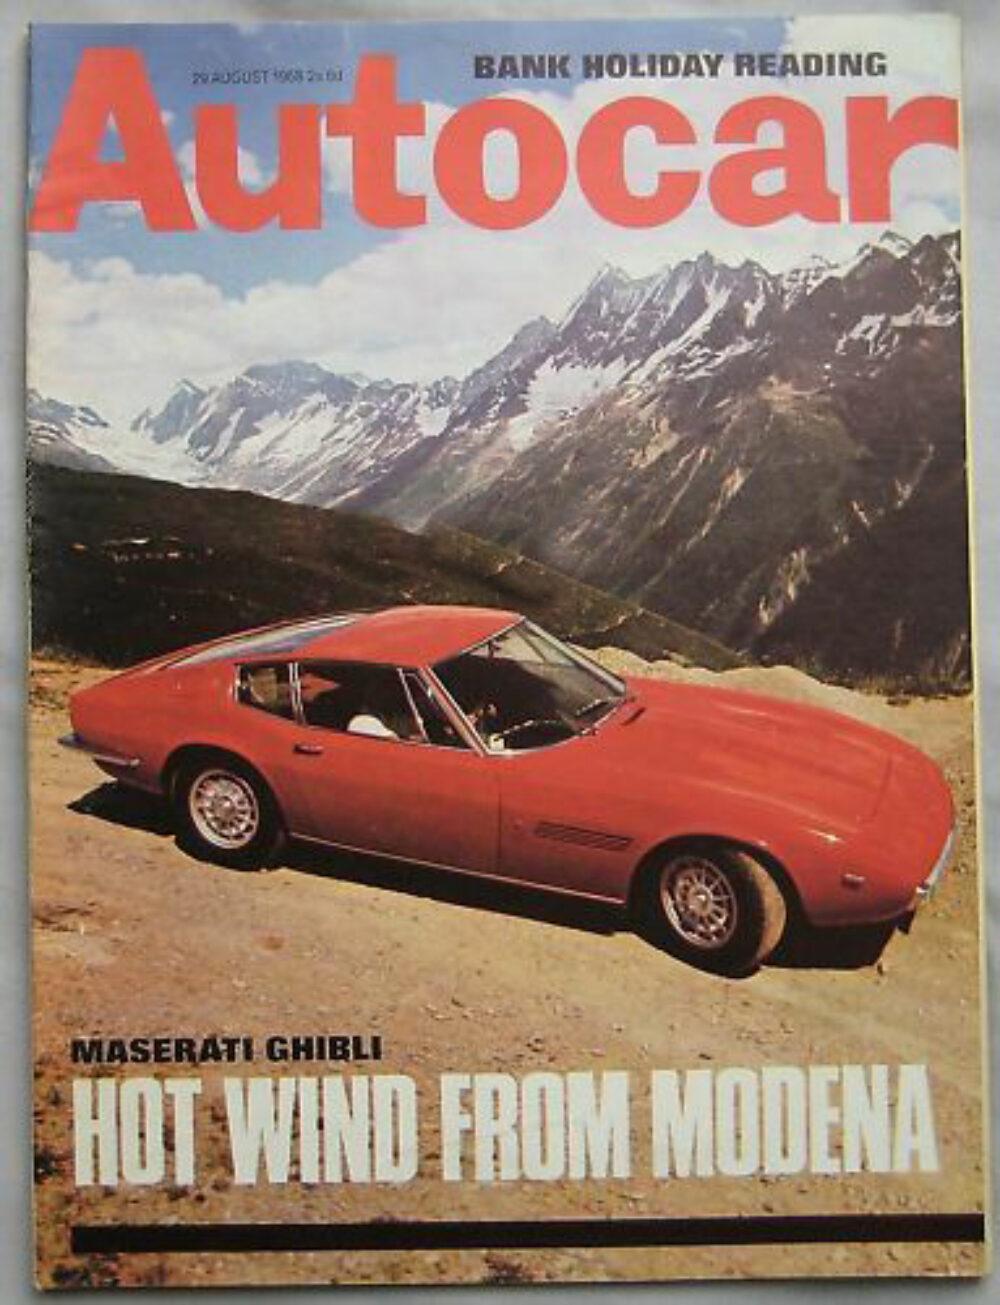 Autocar magazine 29 8 1968 featuring Maserati Ghibli Monteverdi AC